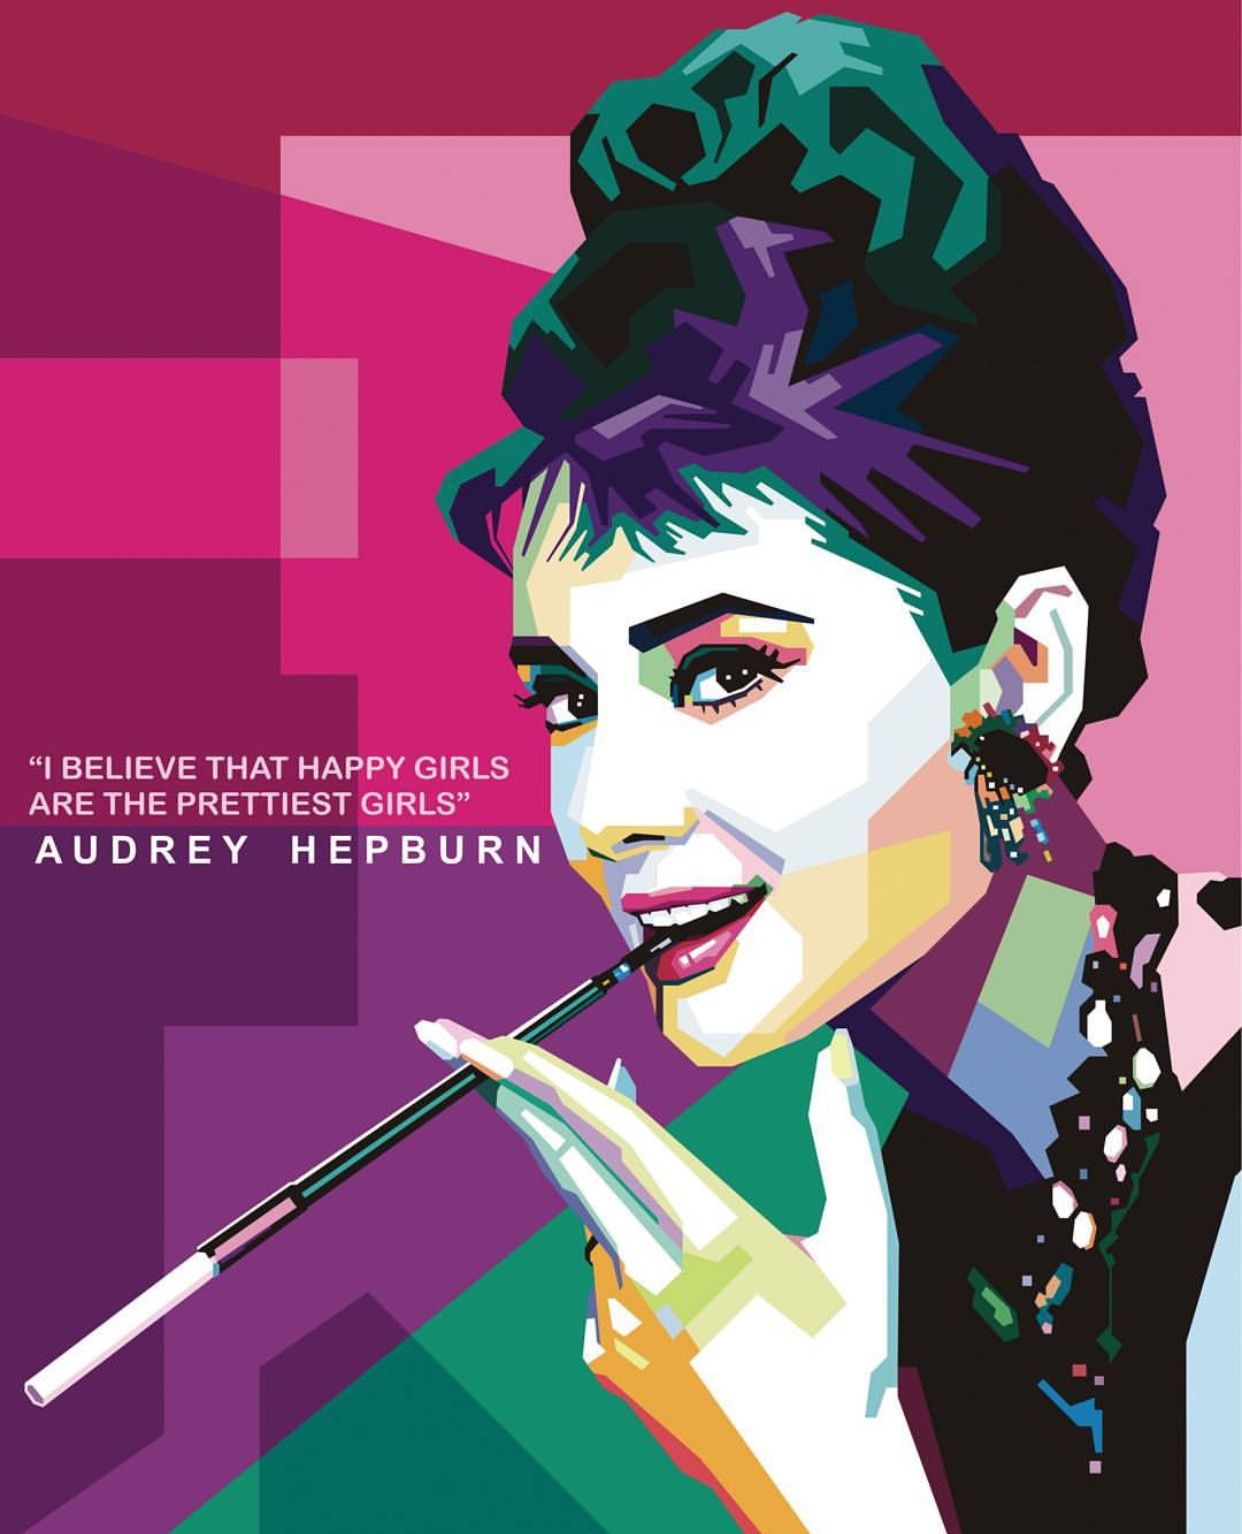 Pin by David Hayes on Audrey Art | Pinterest | Audrey hepburn, Pop ...